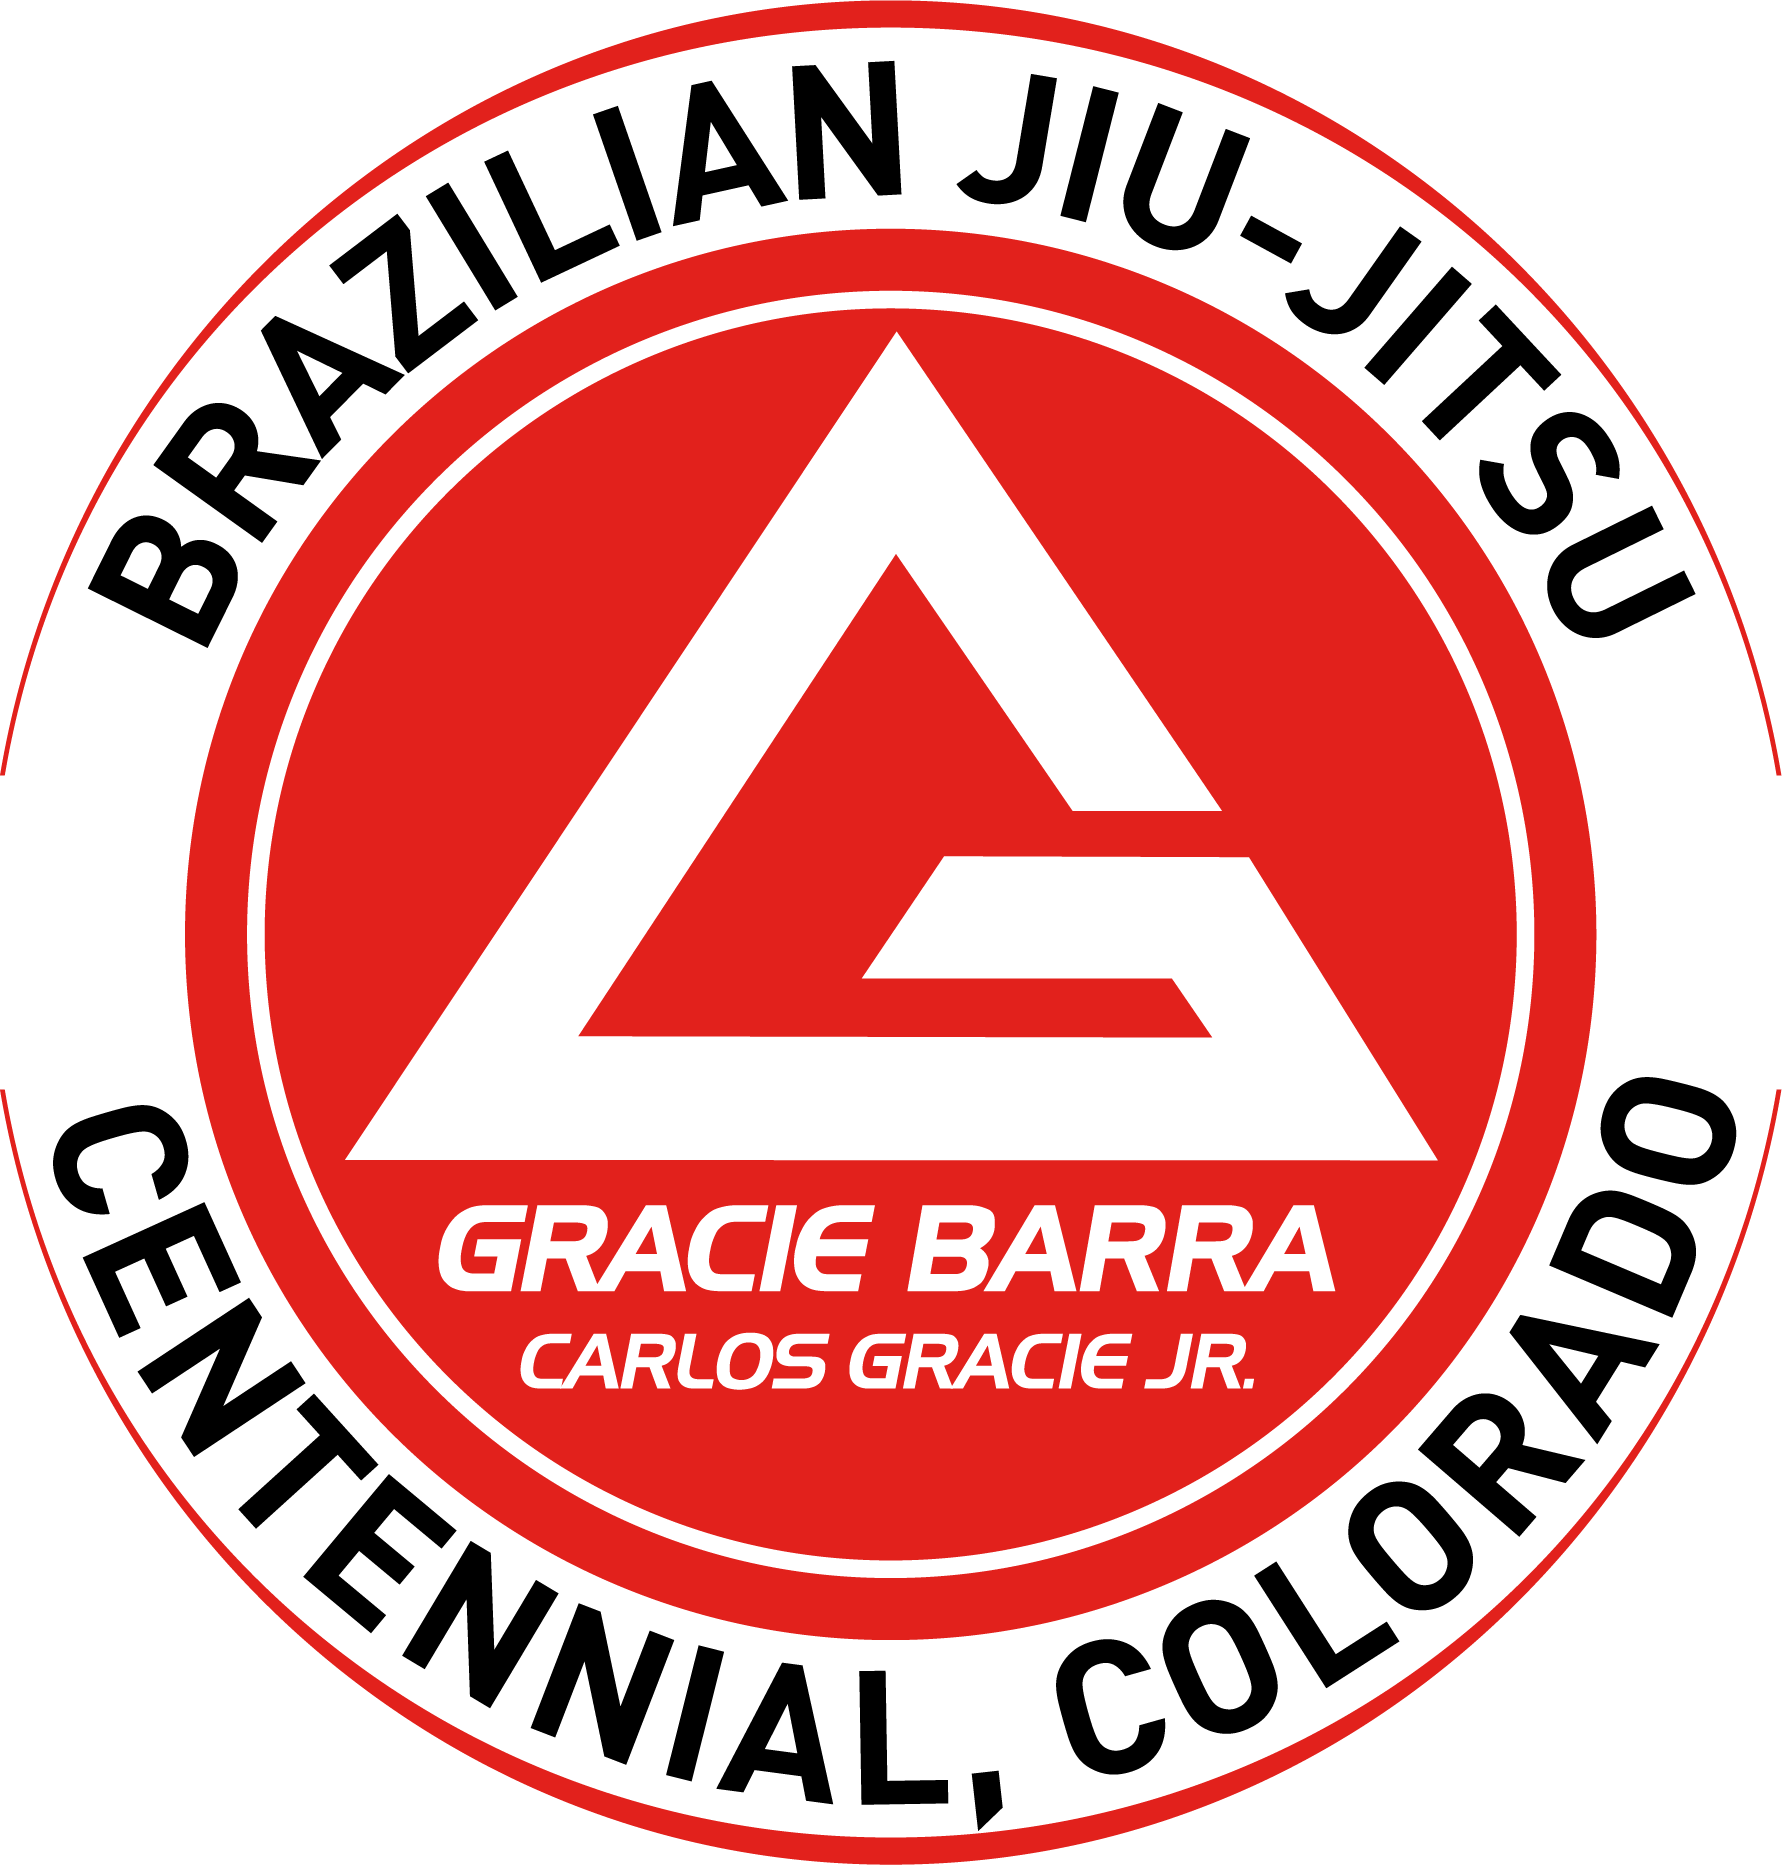 Gracie Barra Centennial Jiu-Jitsu